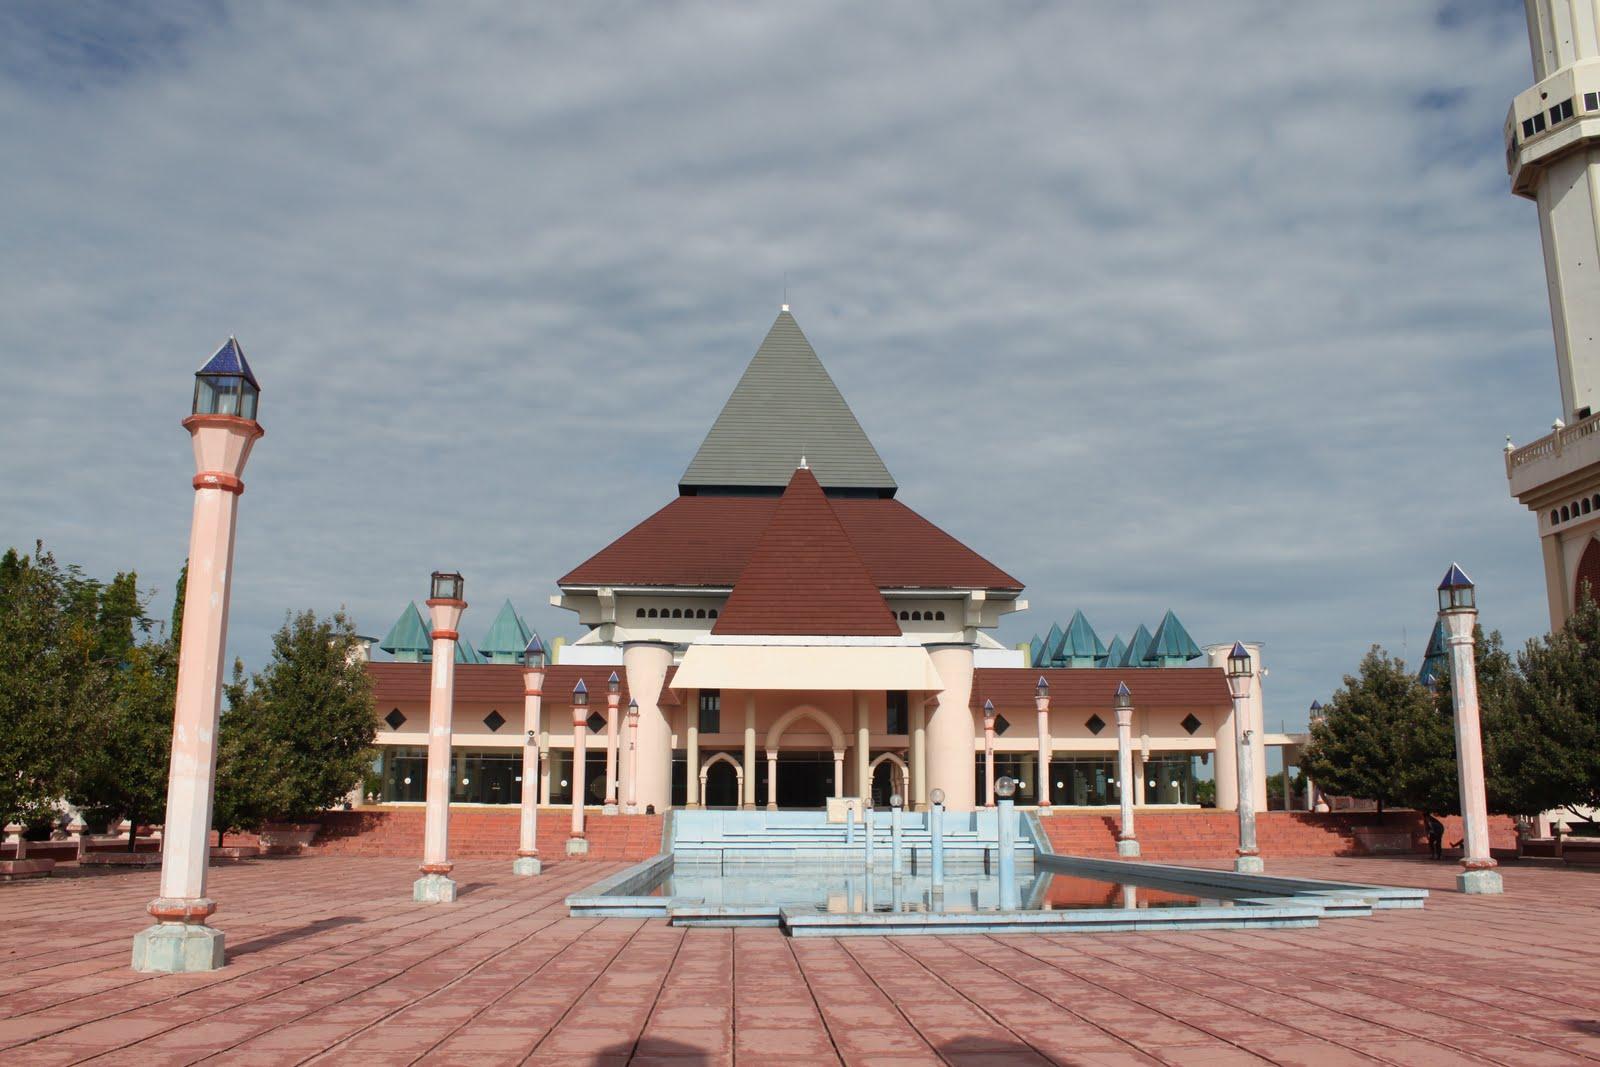 Masjid Nur Pare Kediri Bumi Nusantara Agung Kab